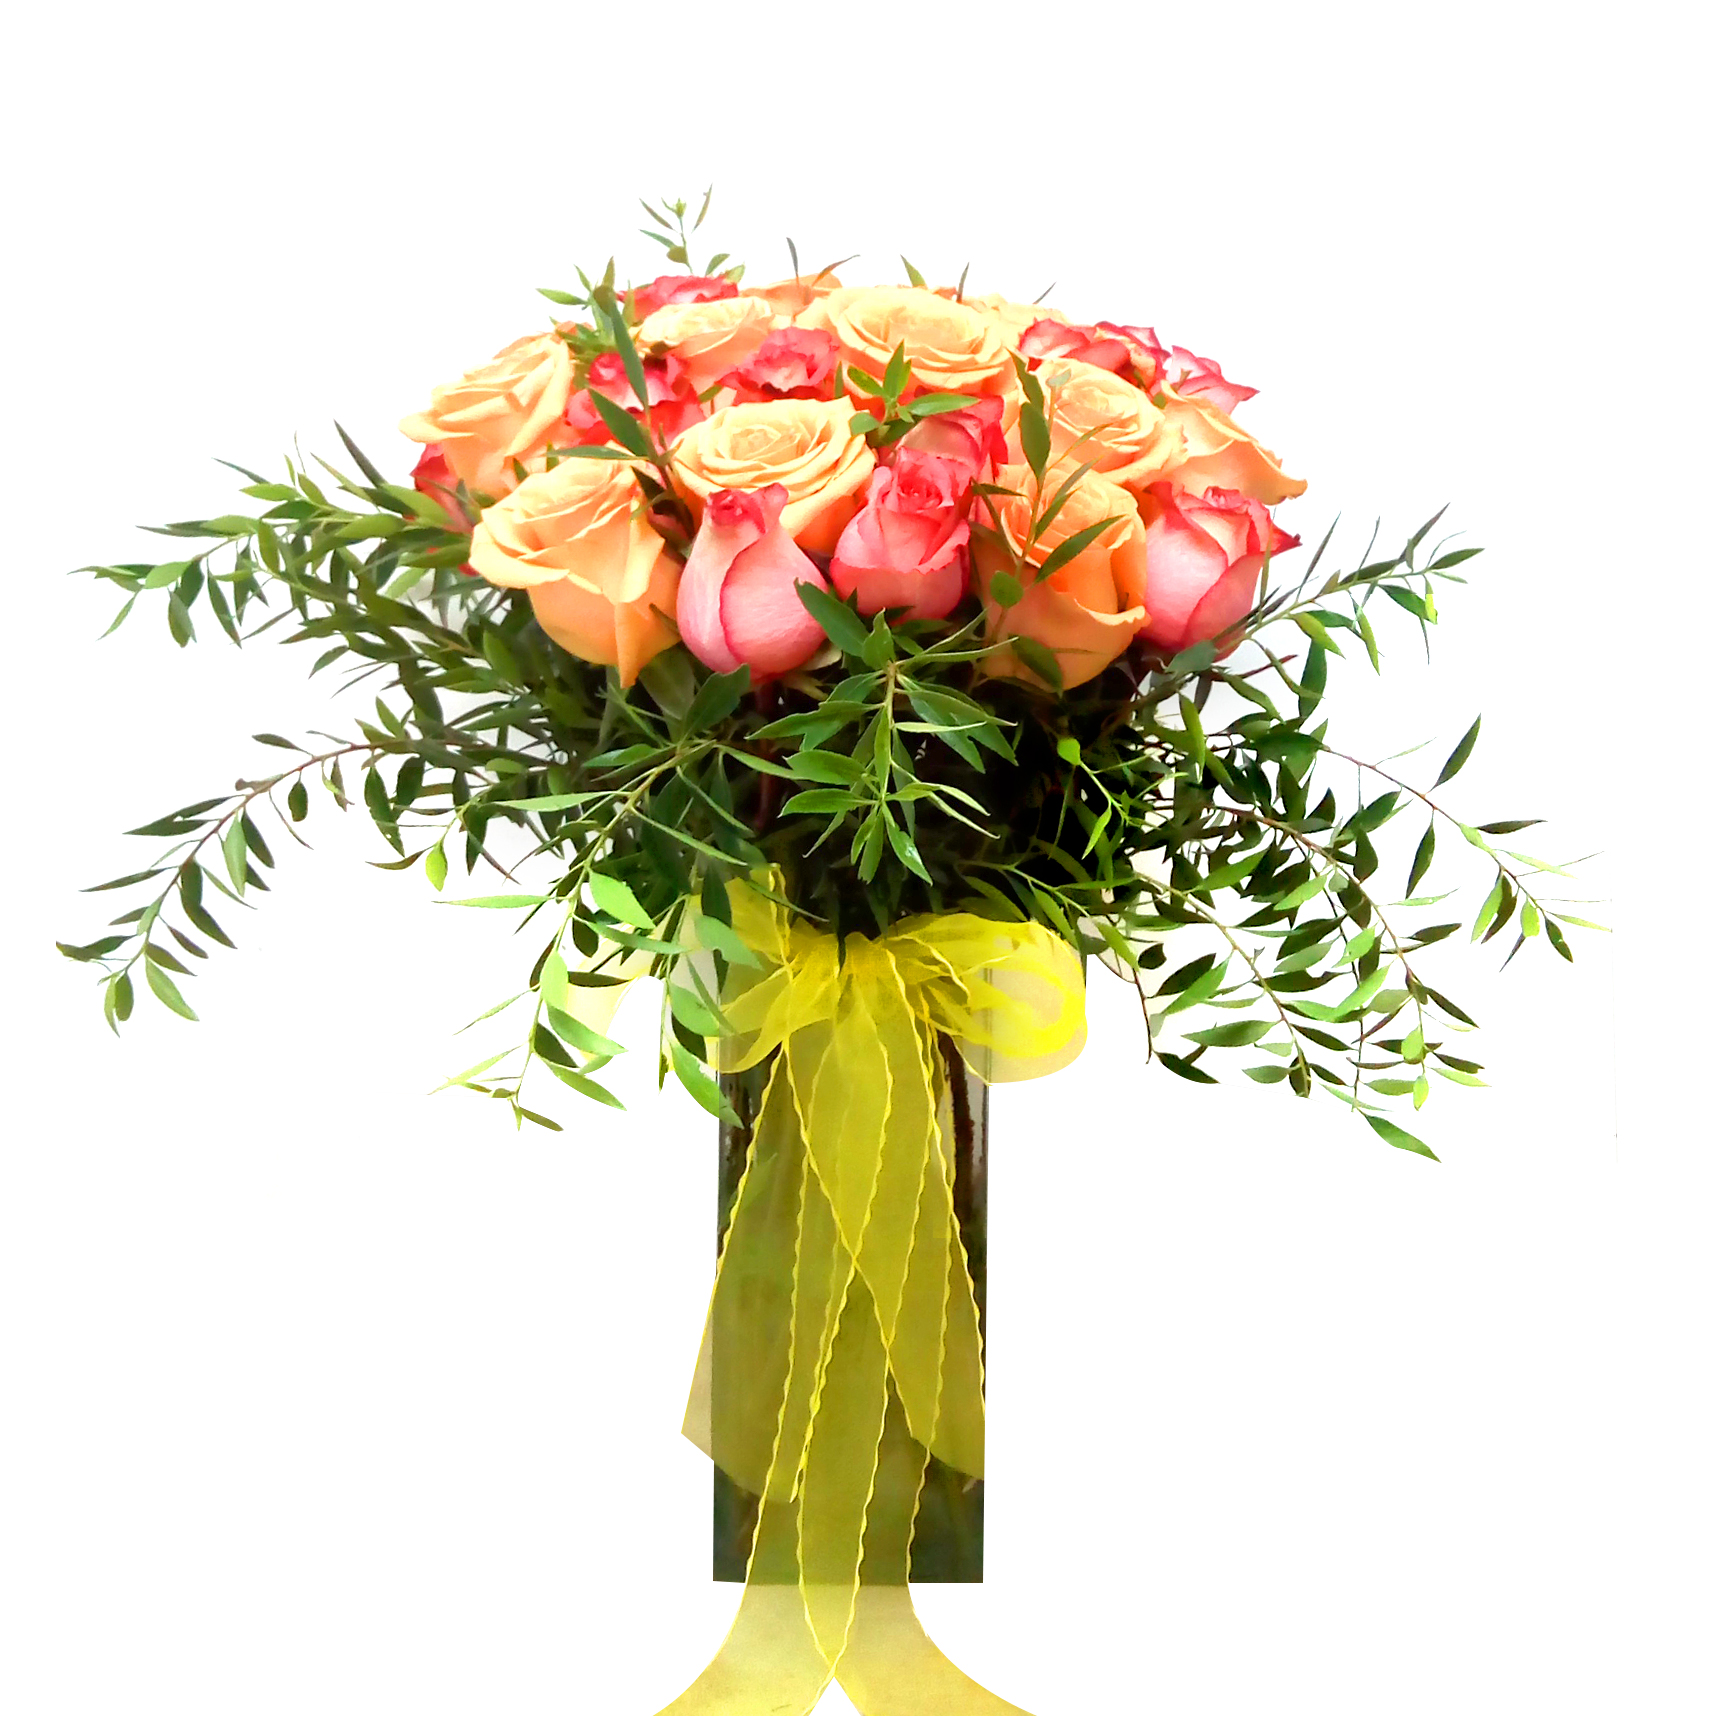 Floreros de Rosas Damasco y Rosadas